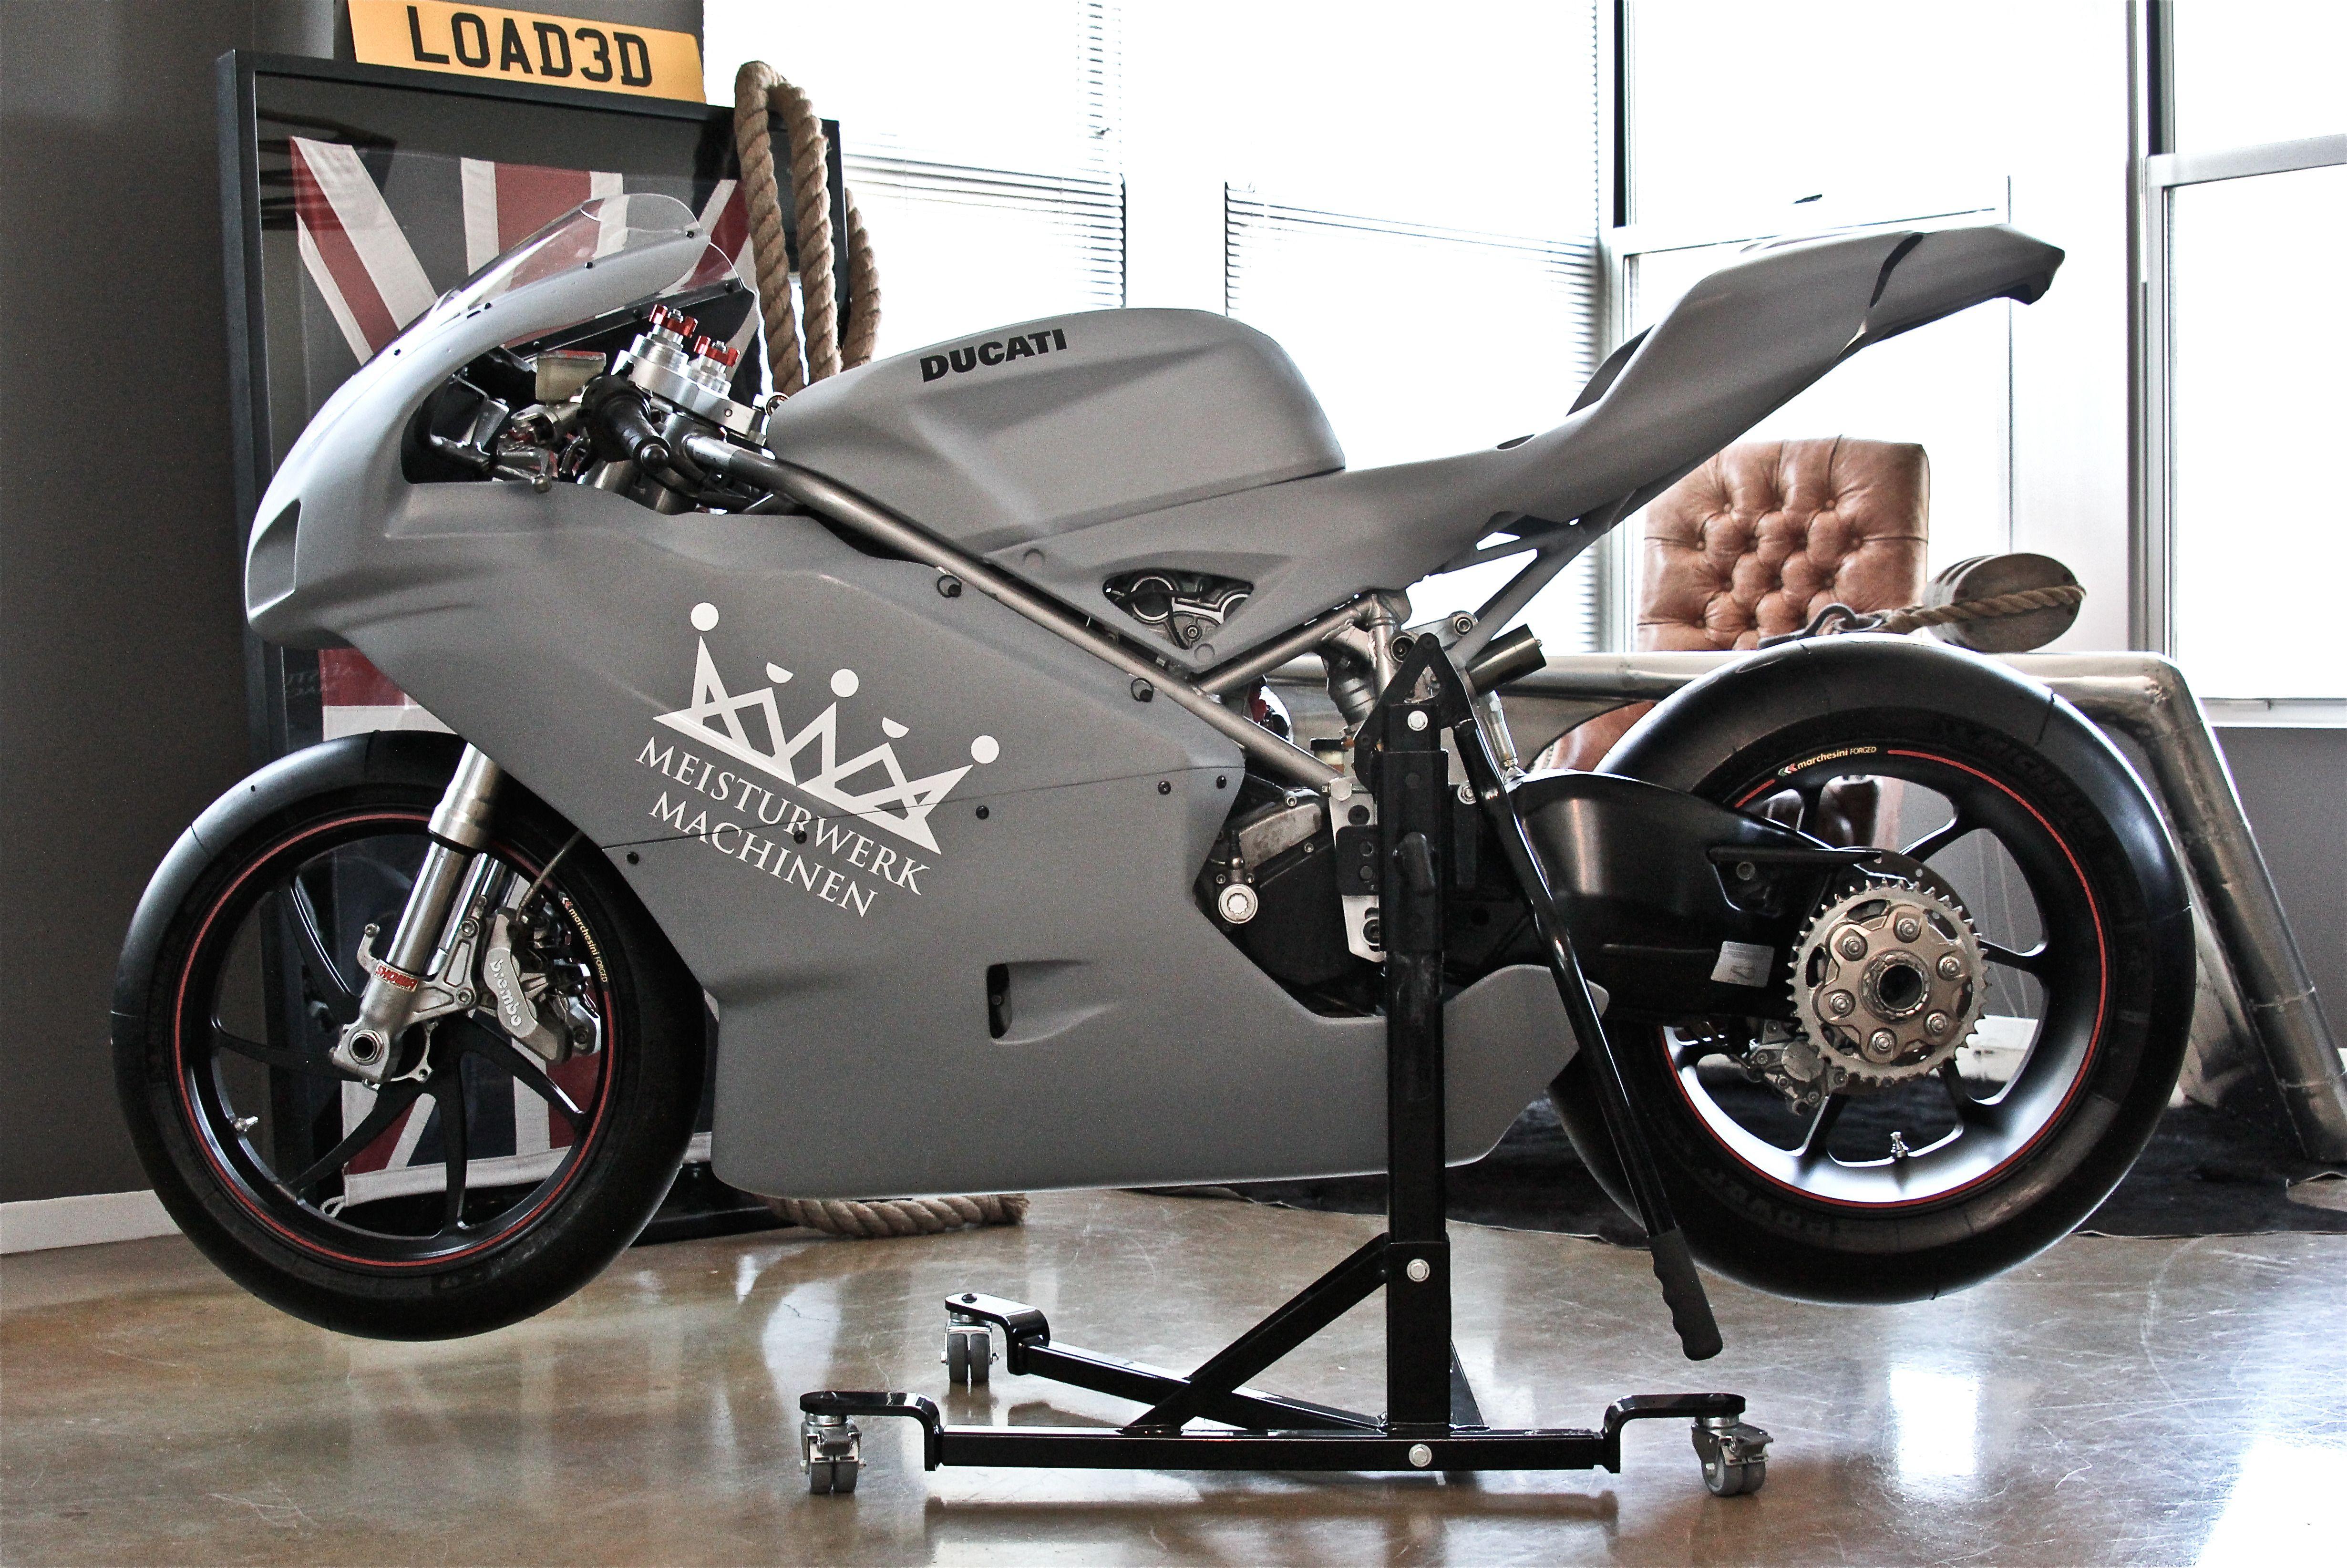 Meisturwerk Motorsports Ducati GP999